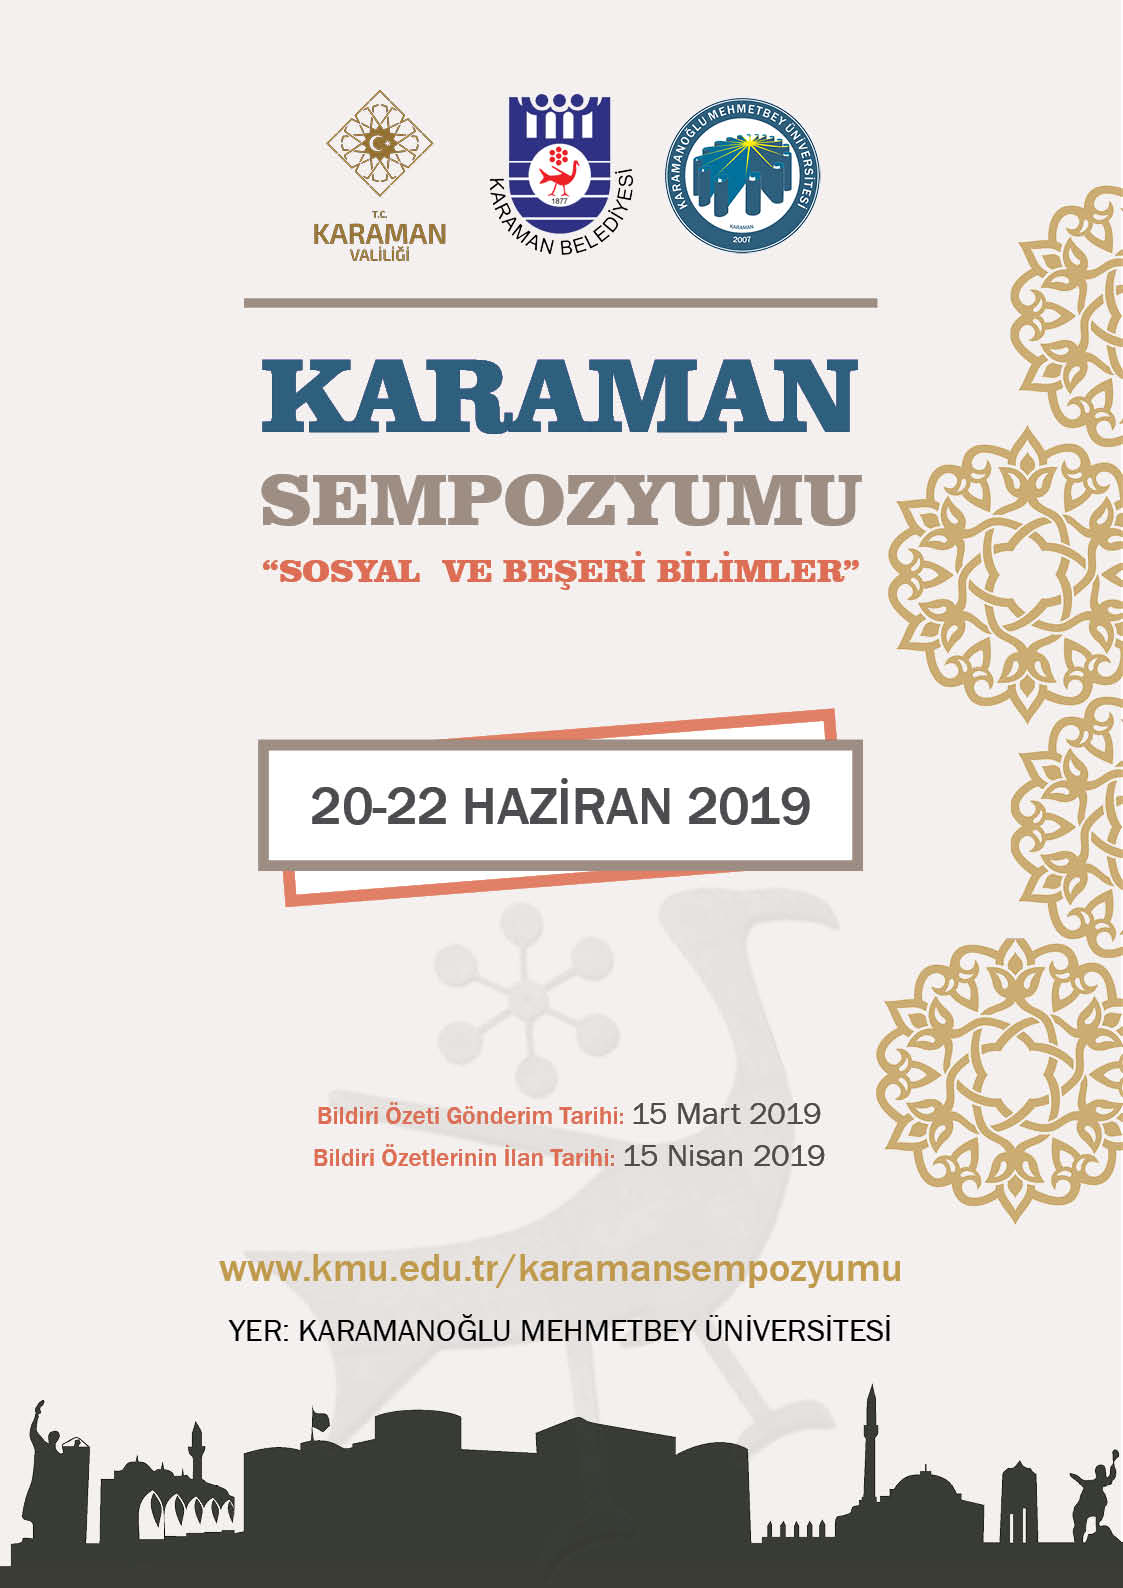 Karaman Sempozyumu